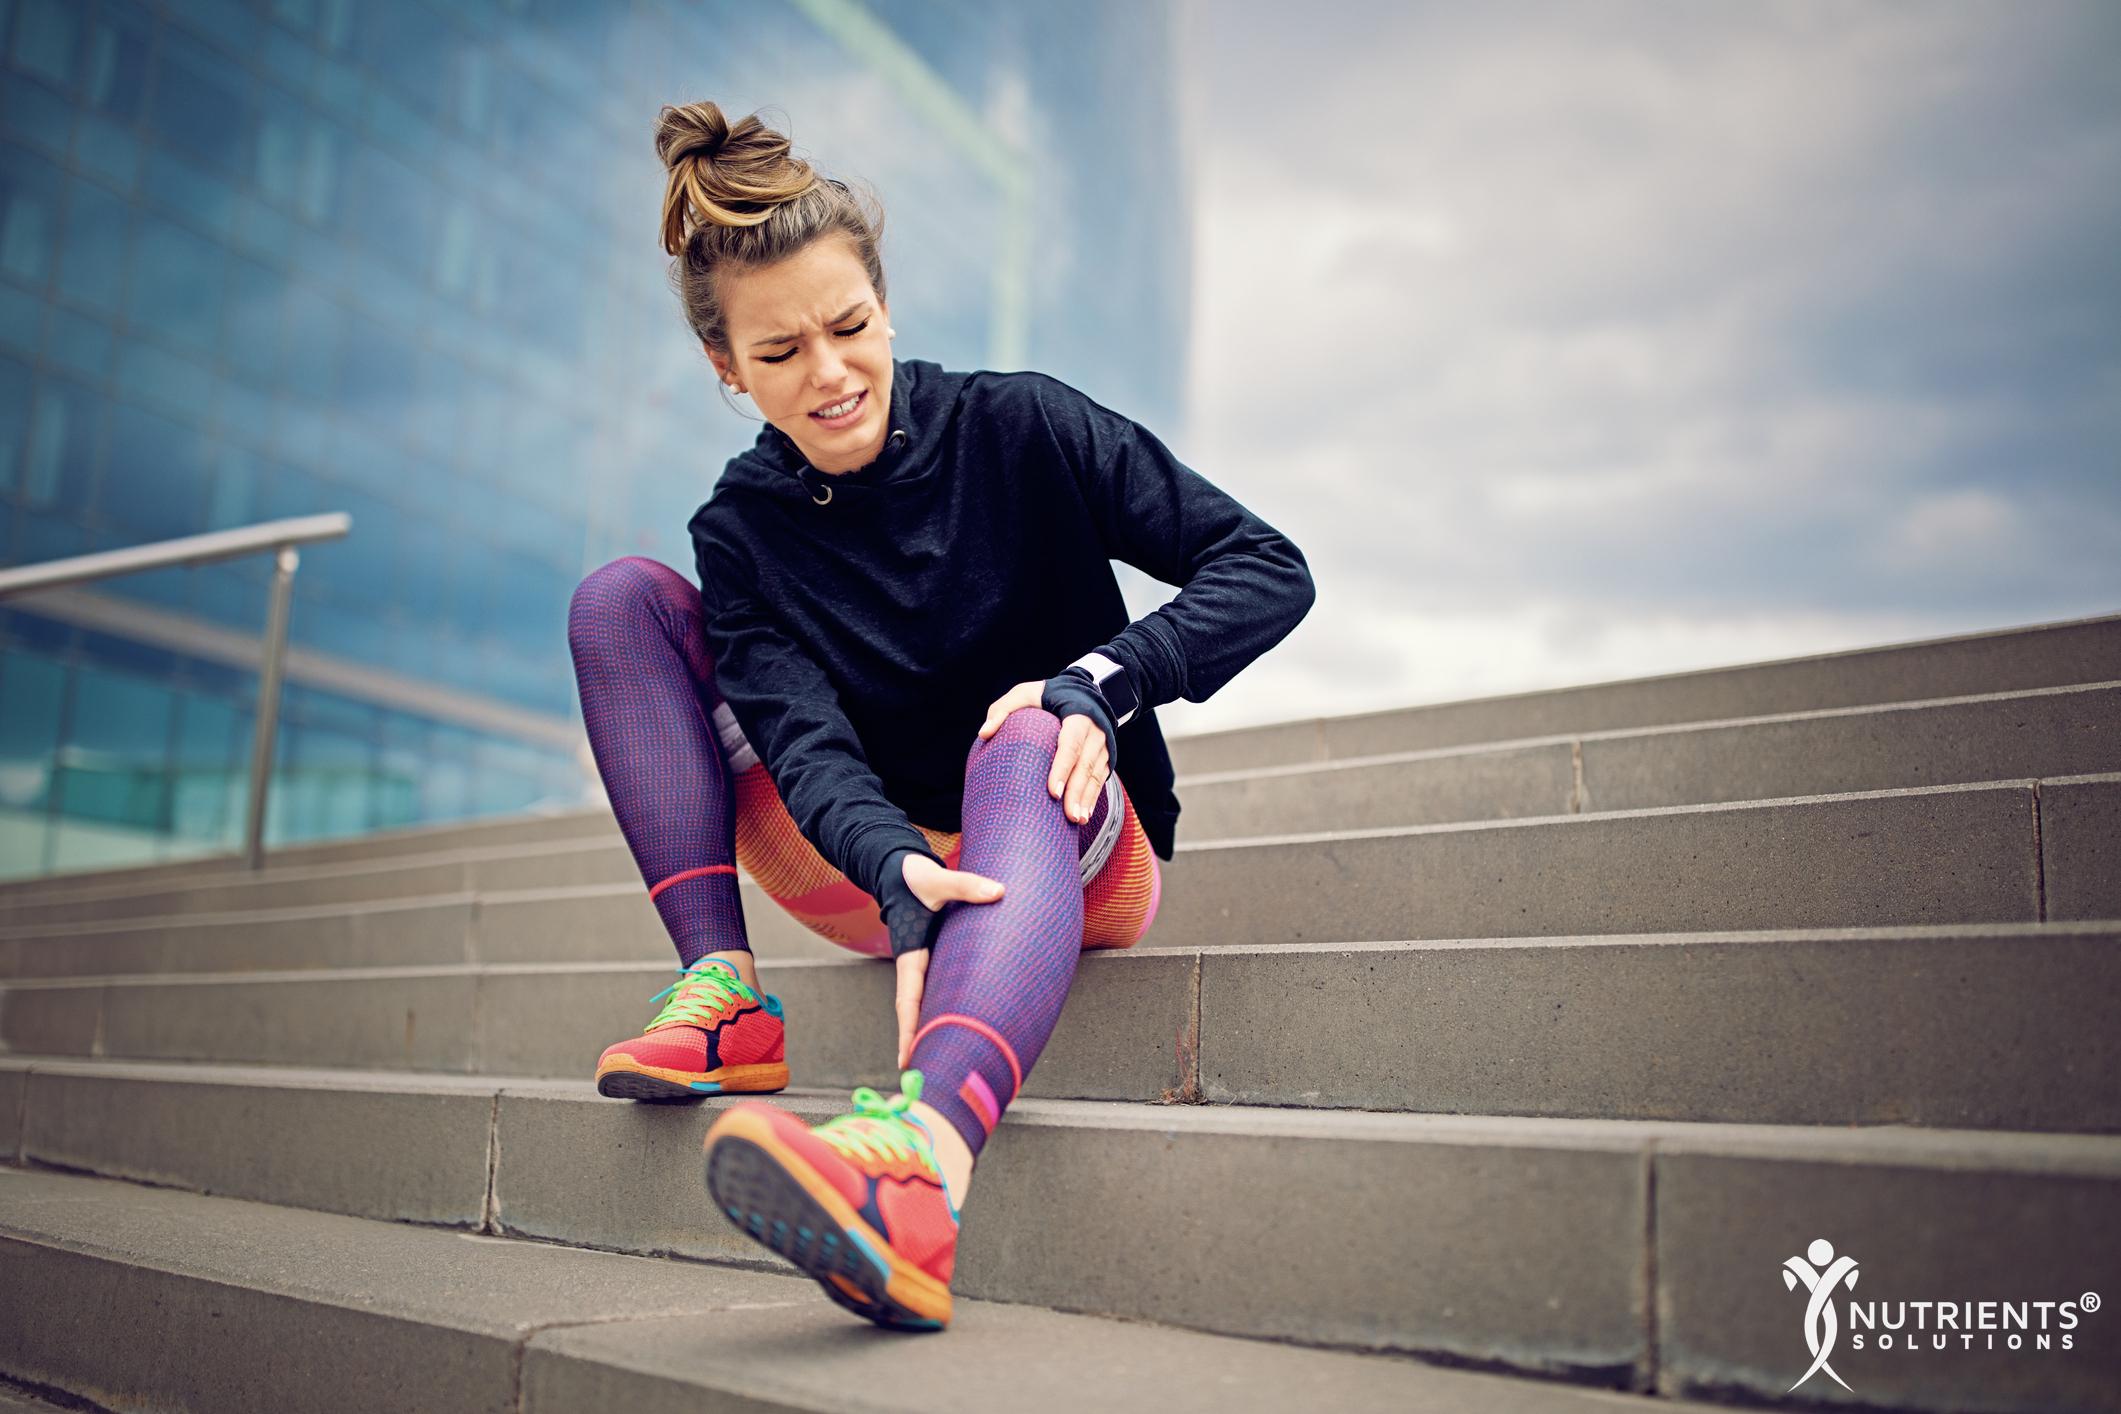 How to Prevent Shin Splints When Running